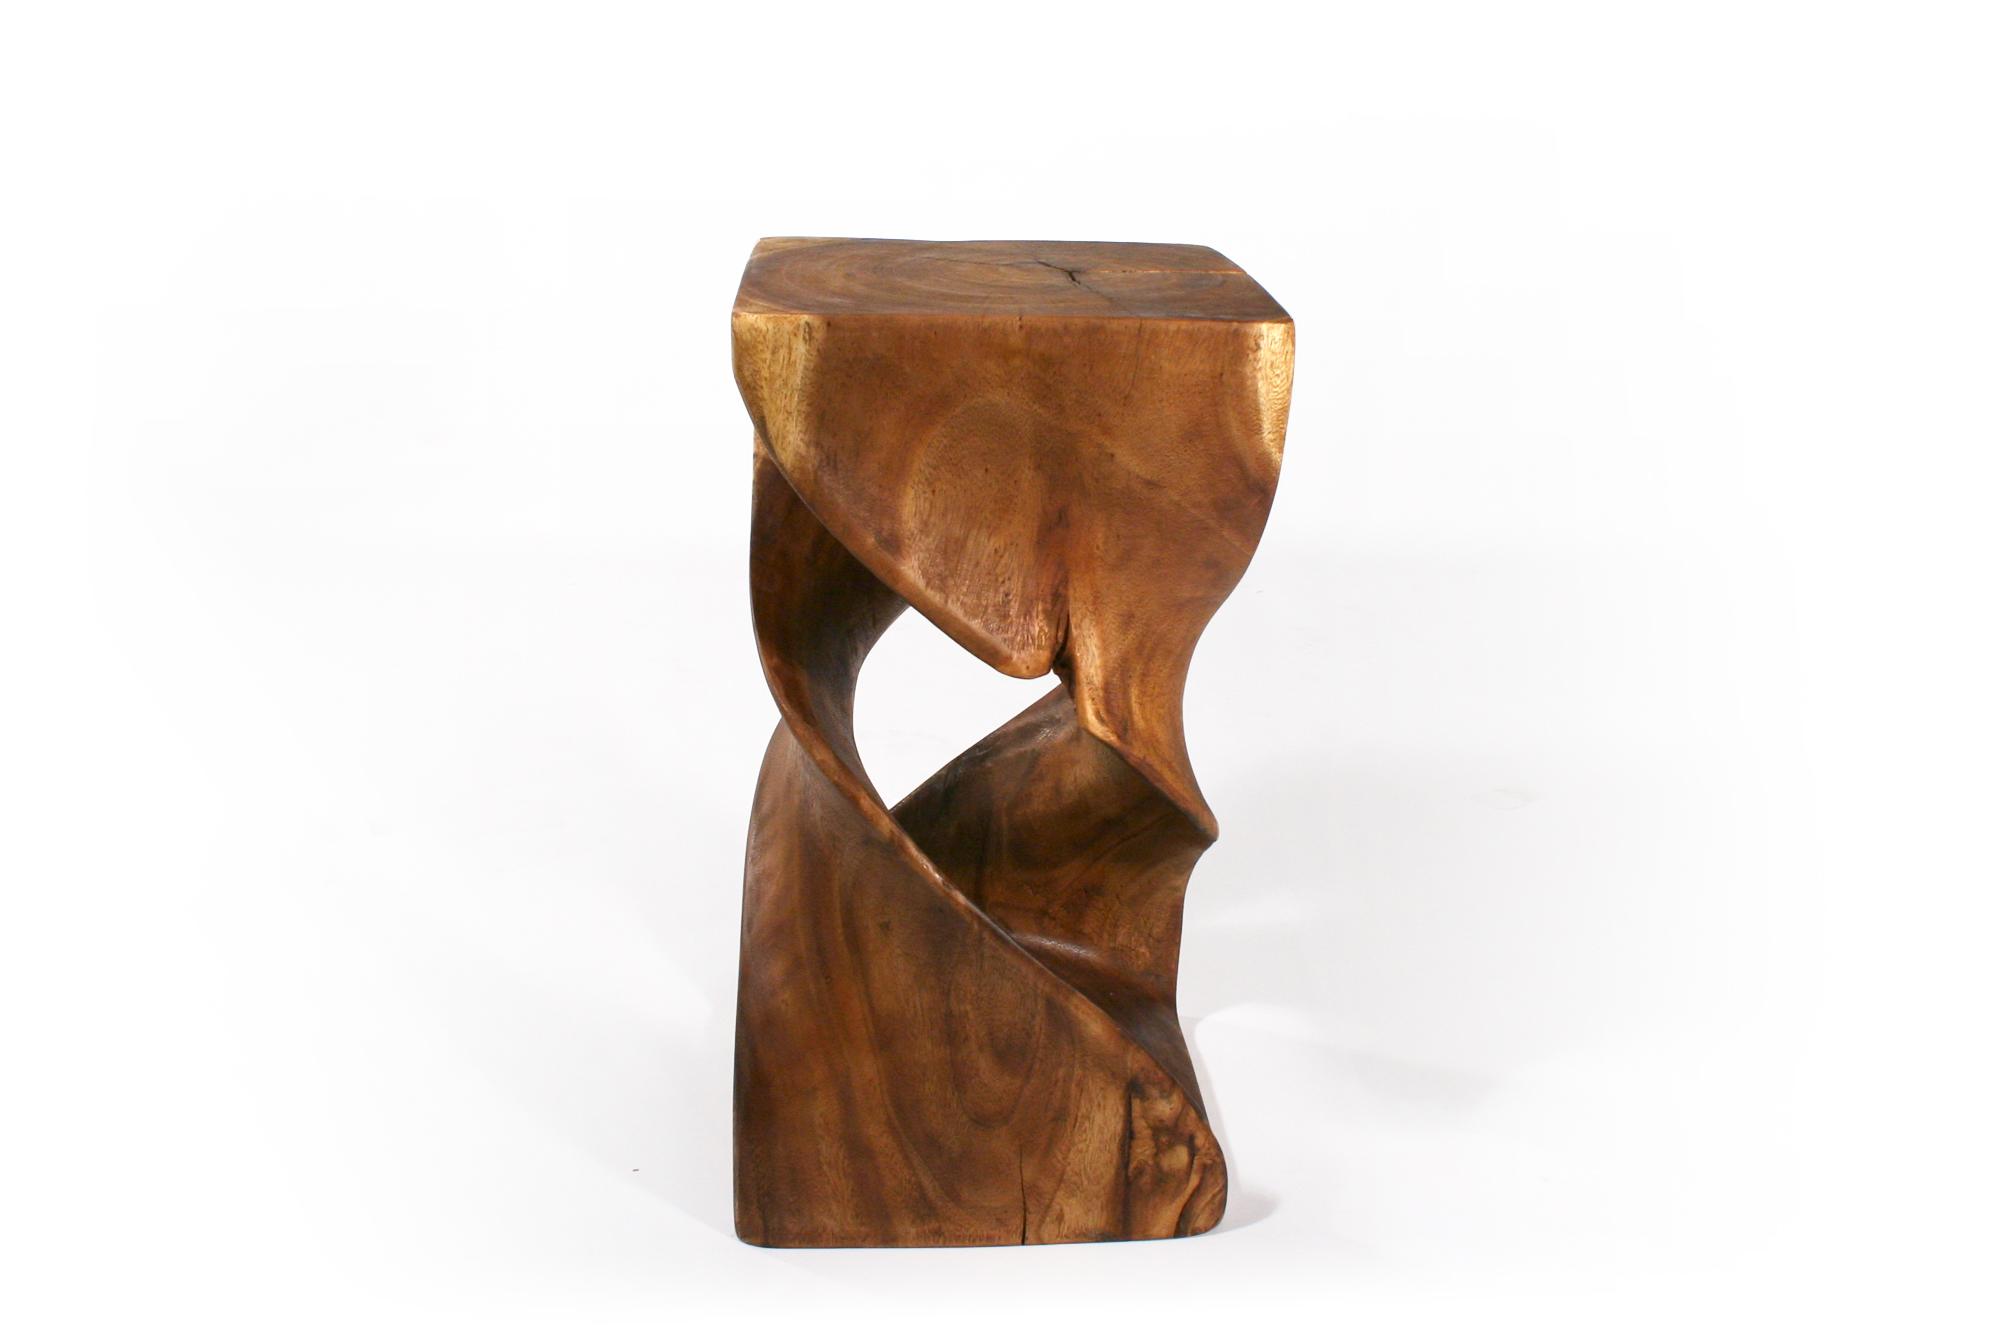 The Double Twist Strata Furniture